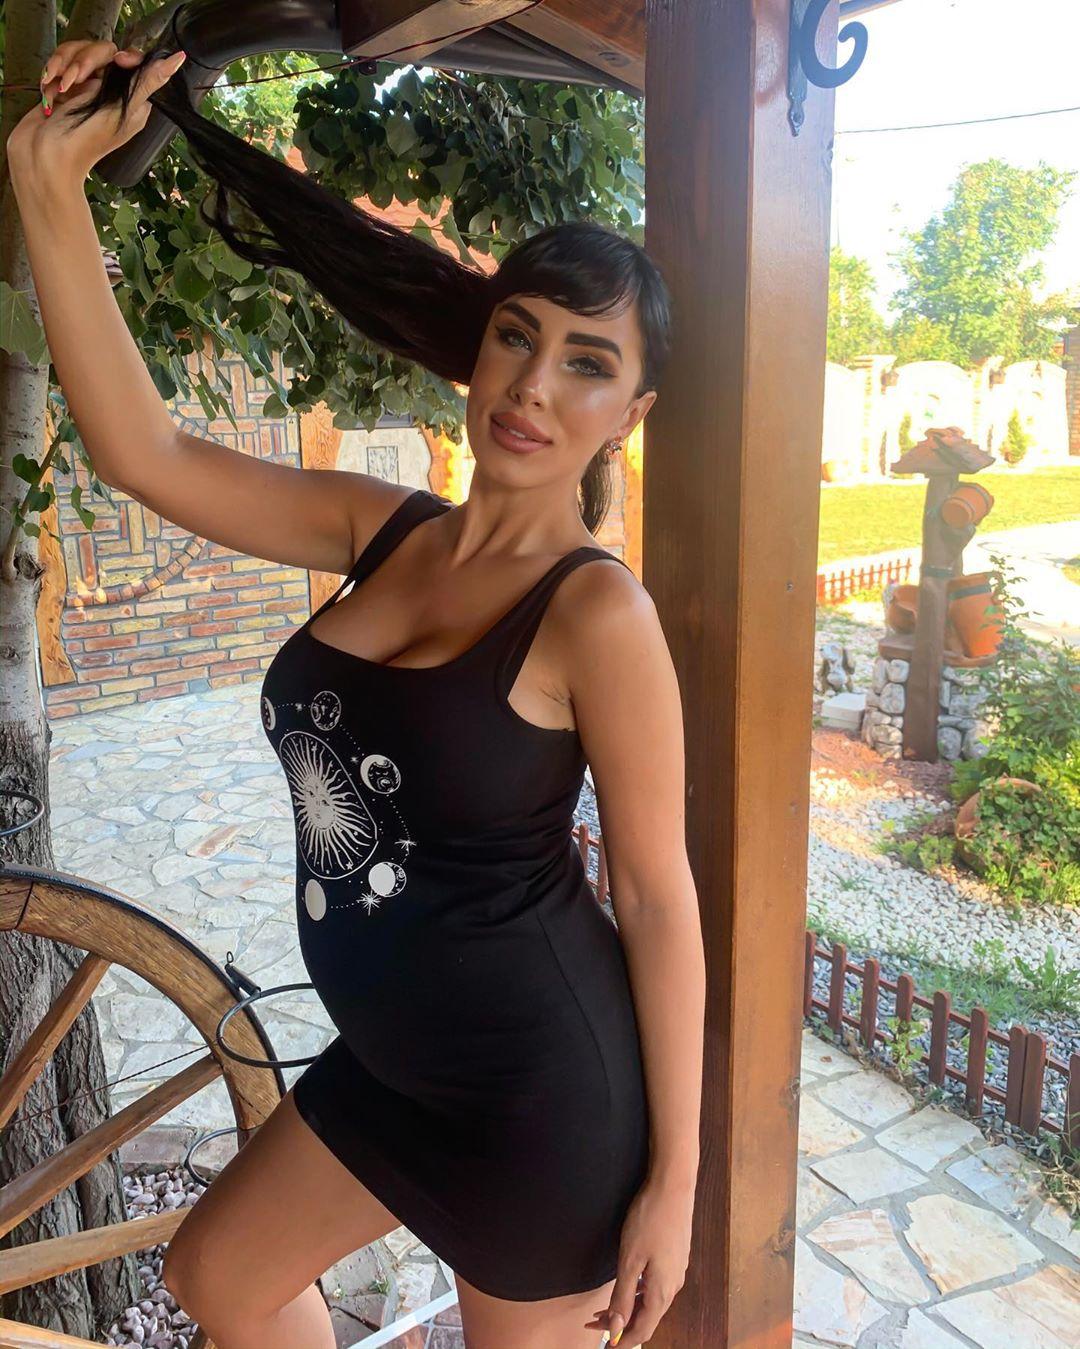 Mislila je da je KRENUO POROĐAJ: Oglasila se Aleksandra Subotić!